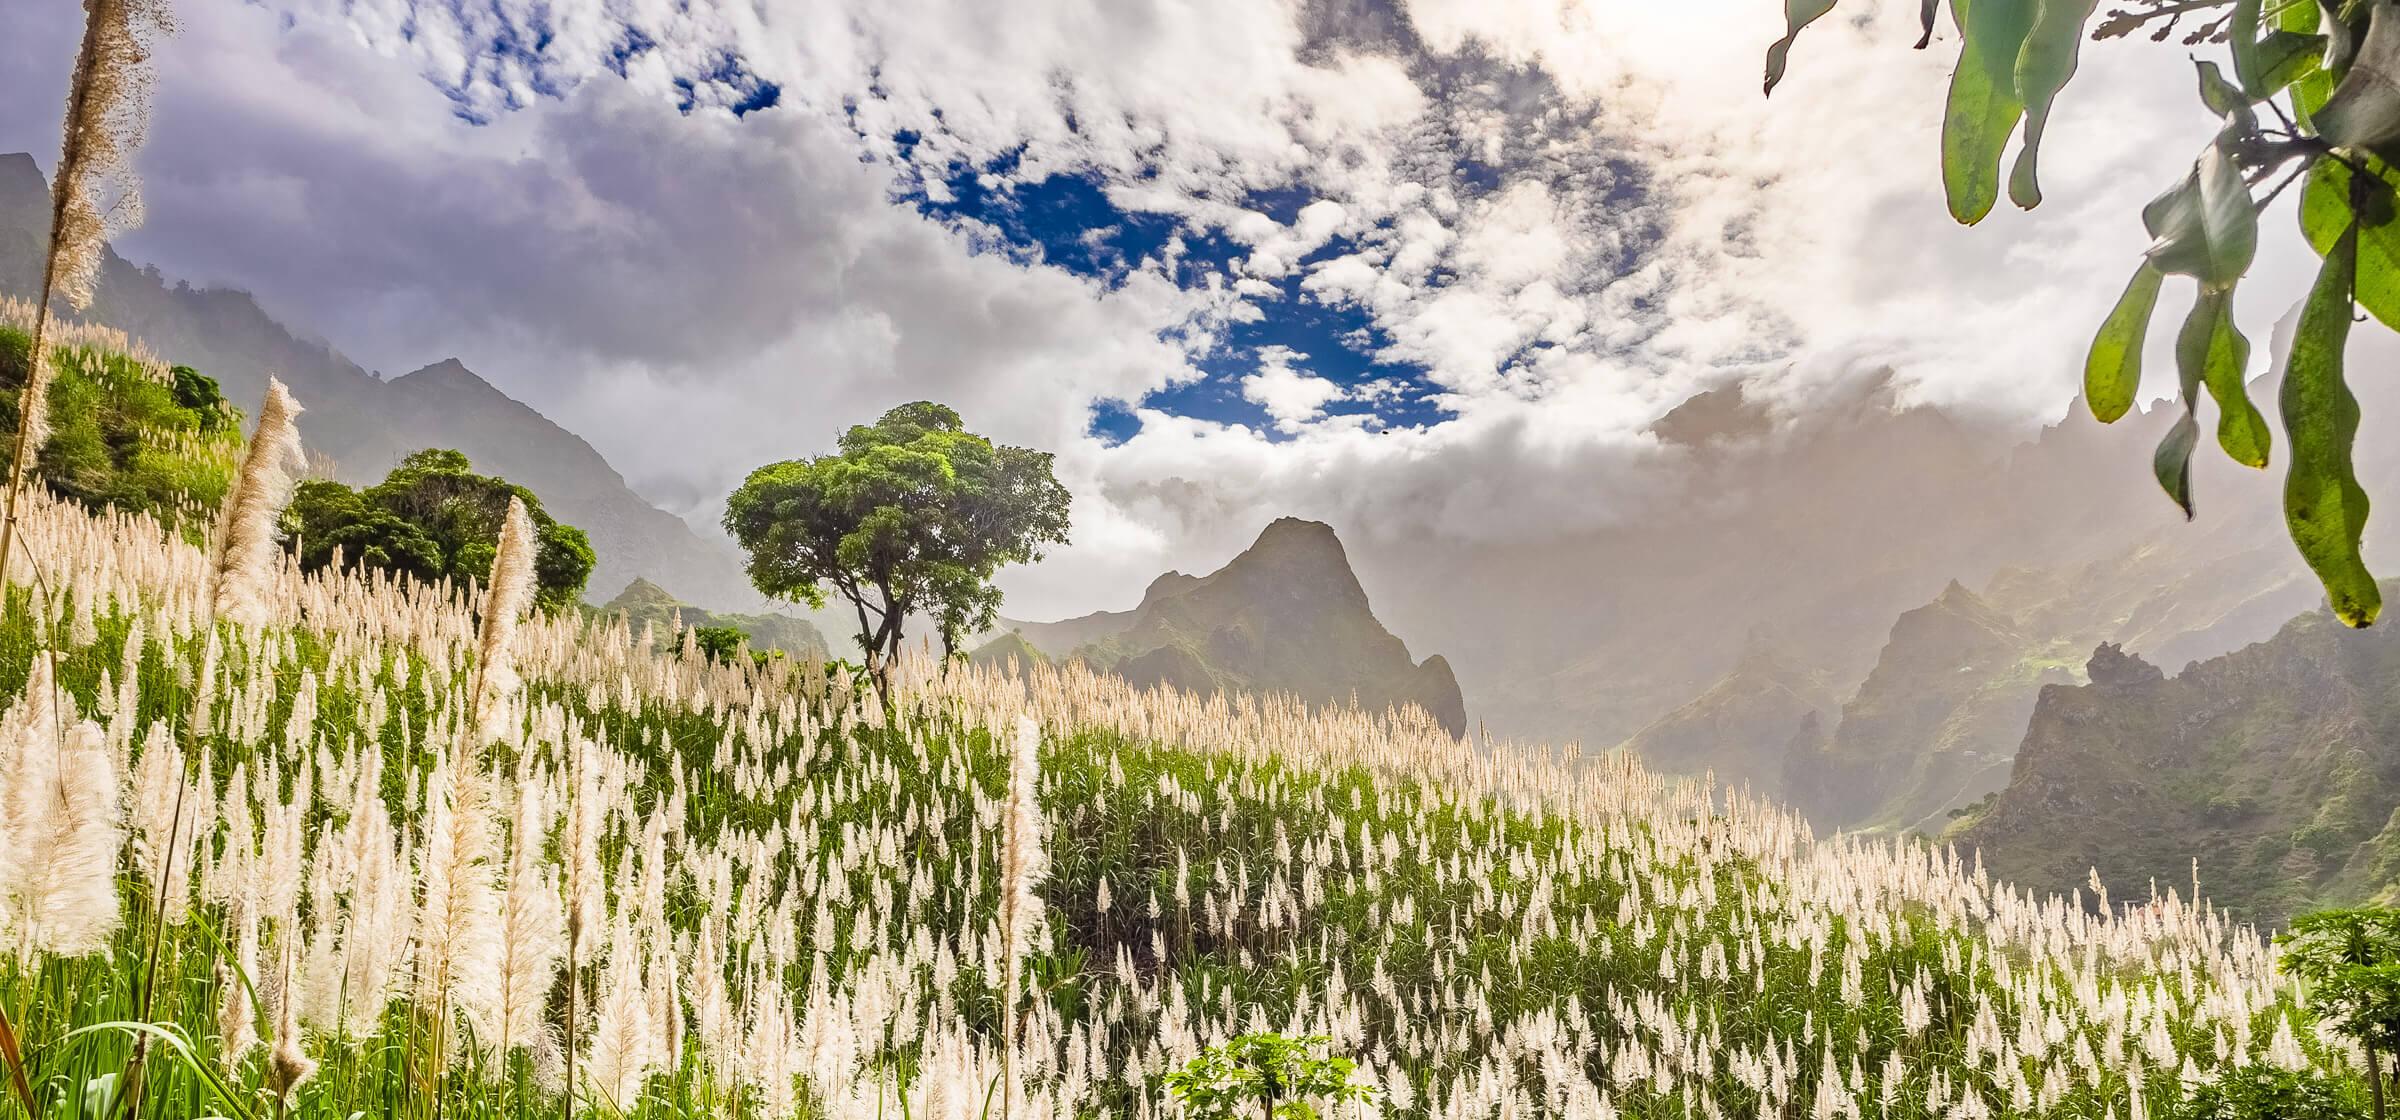 Paul Valley, Santo Antao Island, Cape Verde